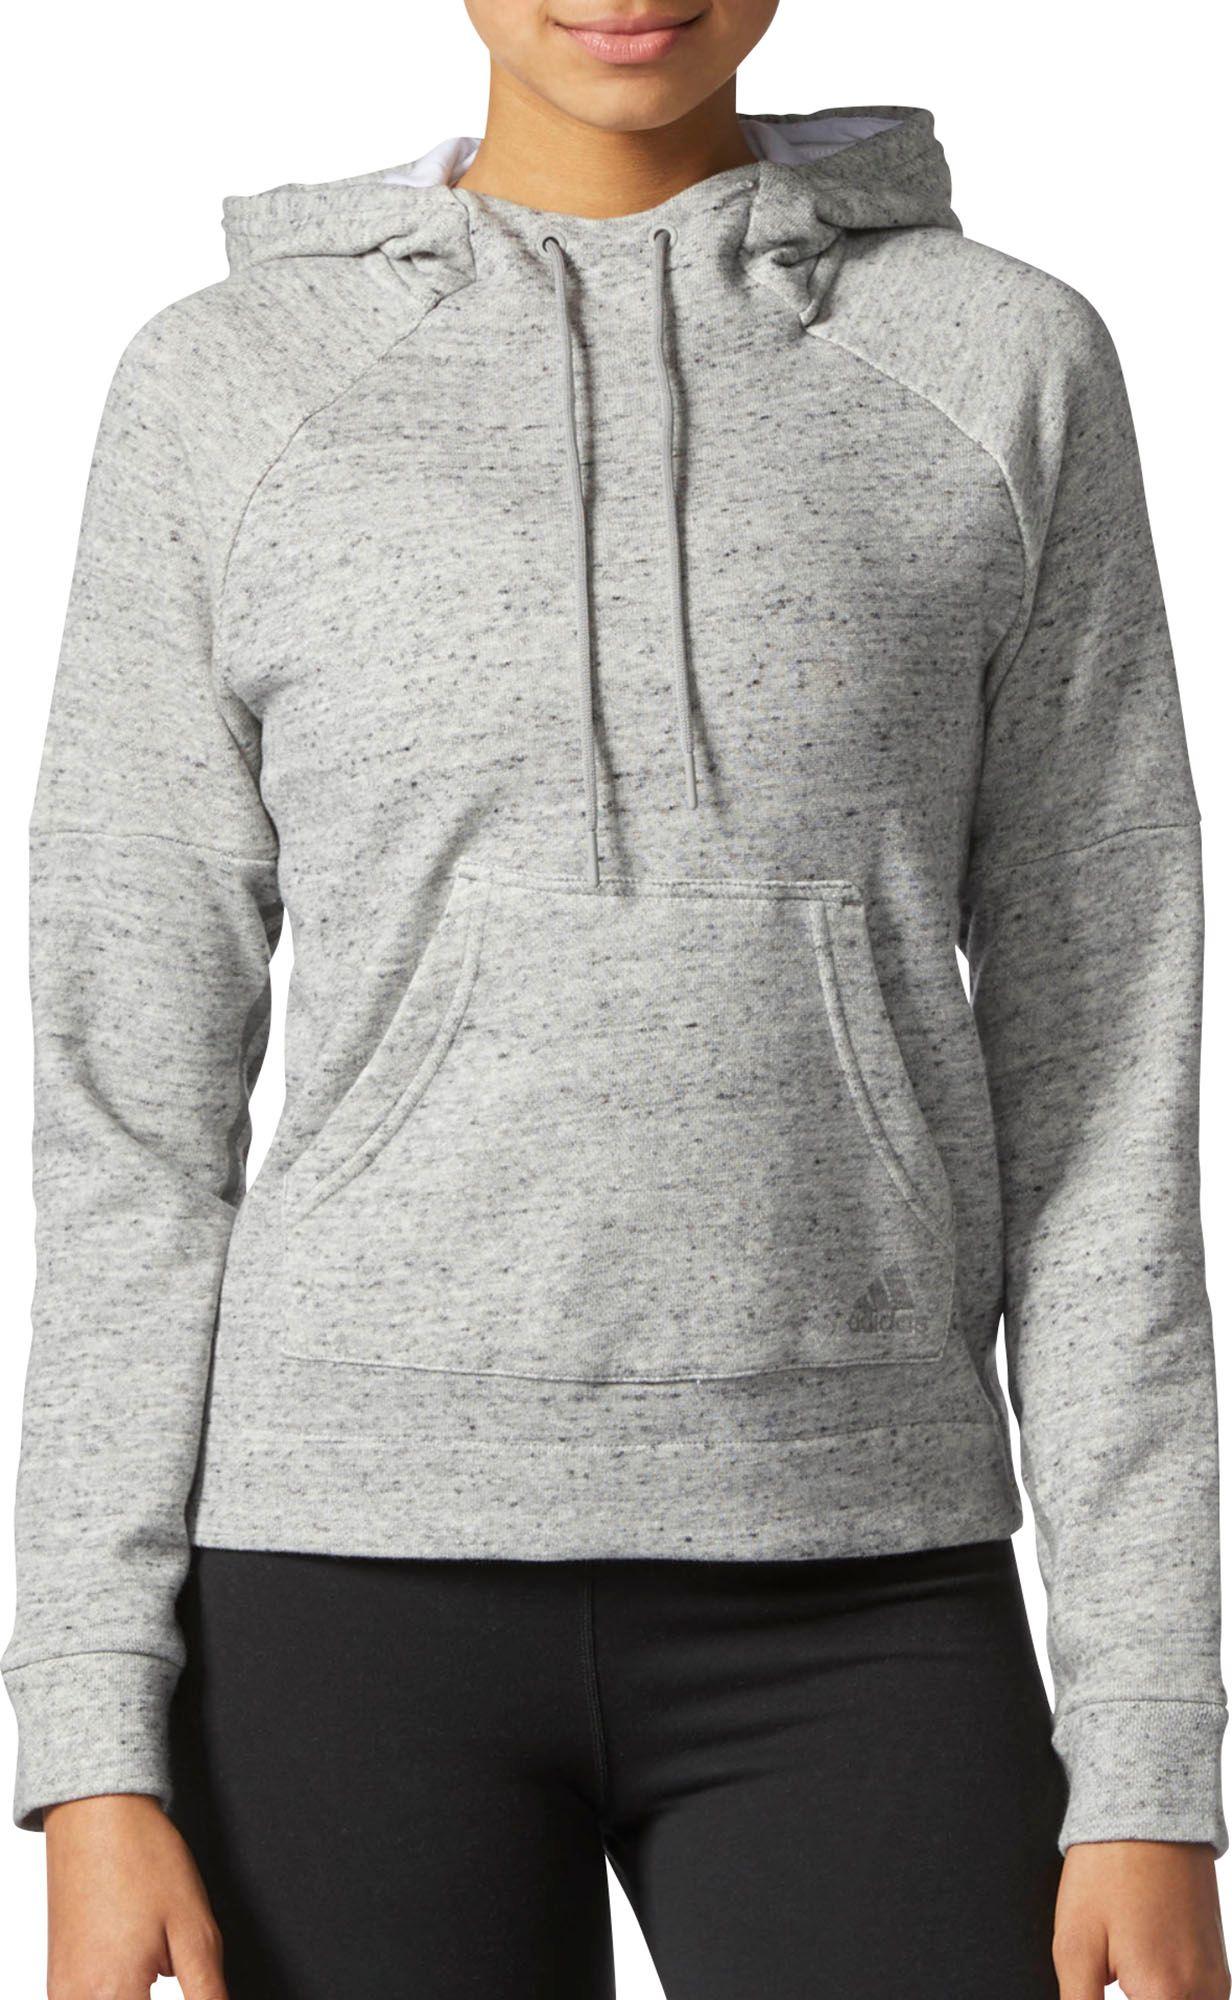 adidas hoodie womens. product image · adidas women\u0027s sport2street hoodie womens